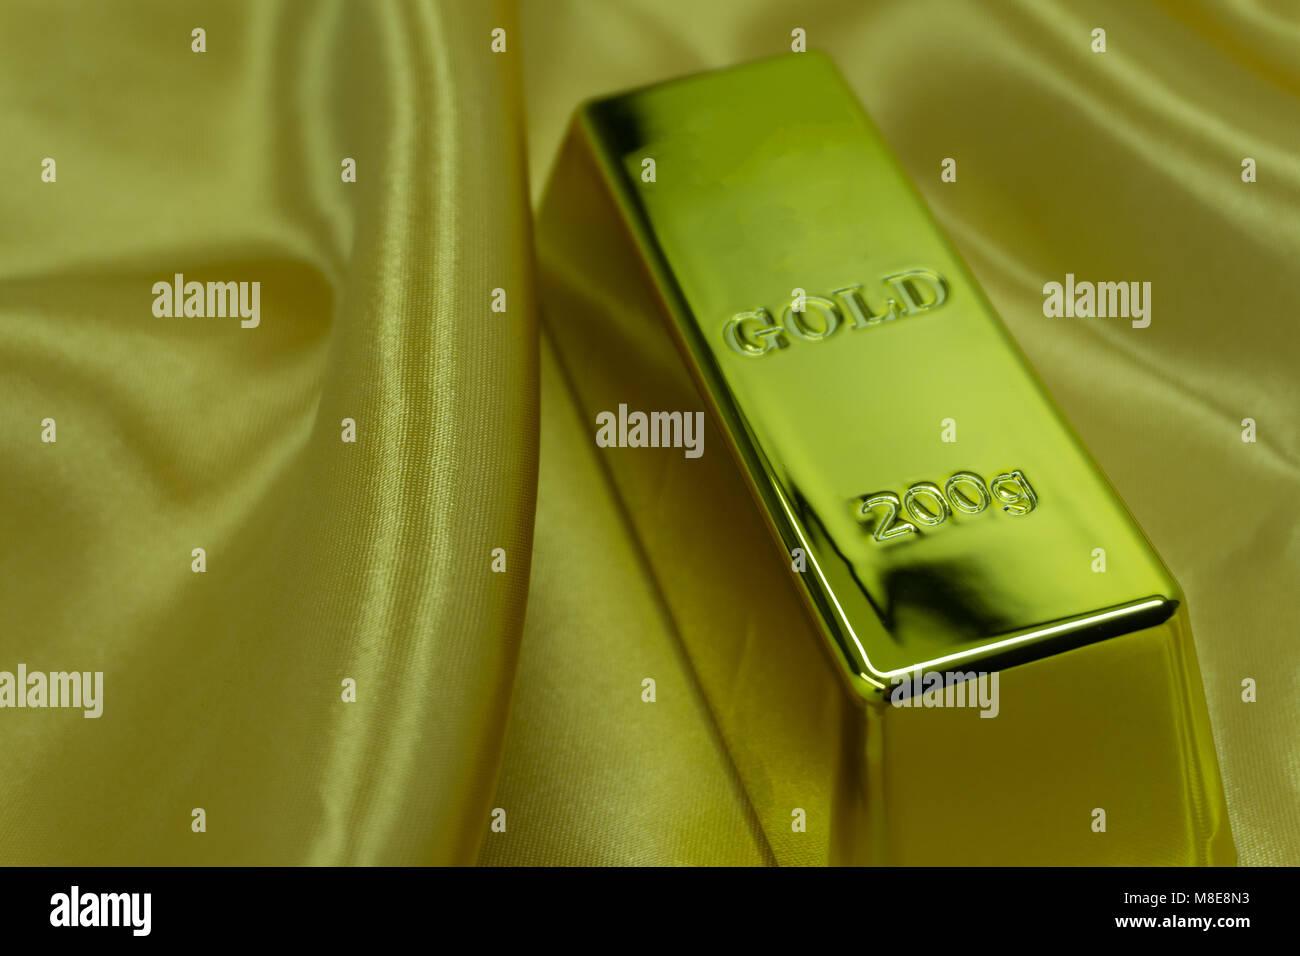 Gold ingot on the surface - Stock Image